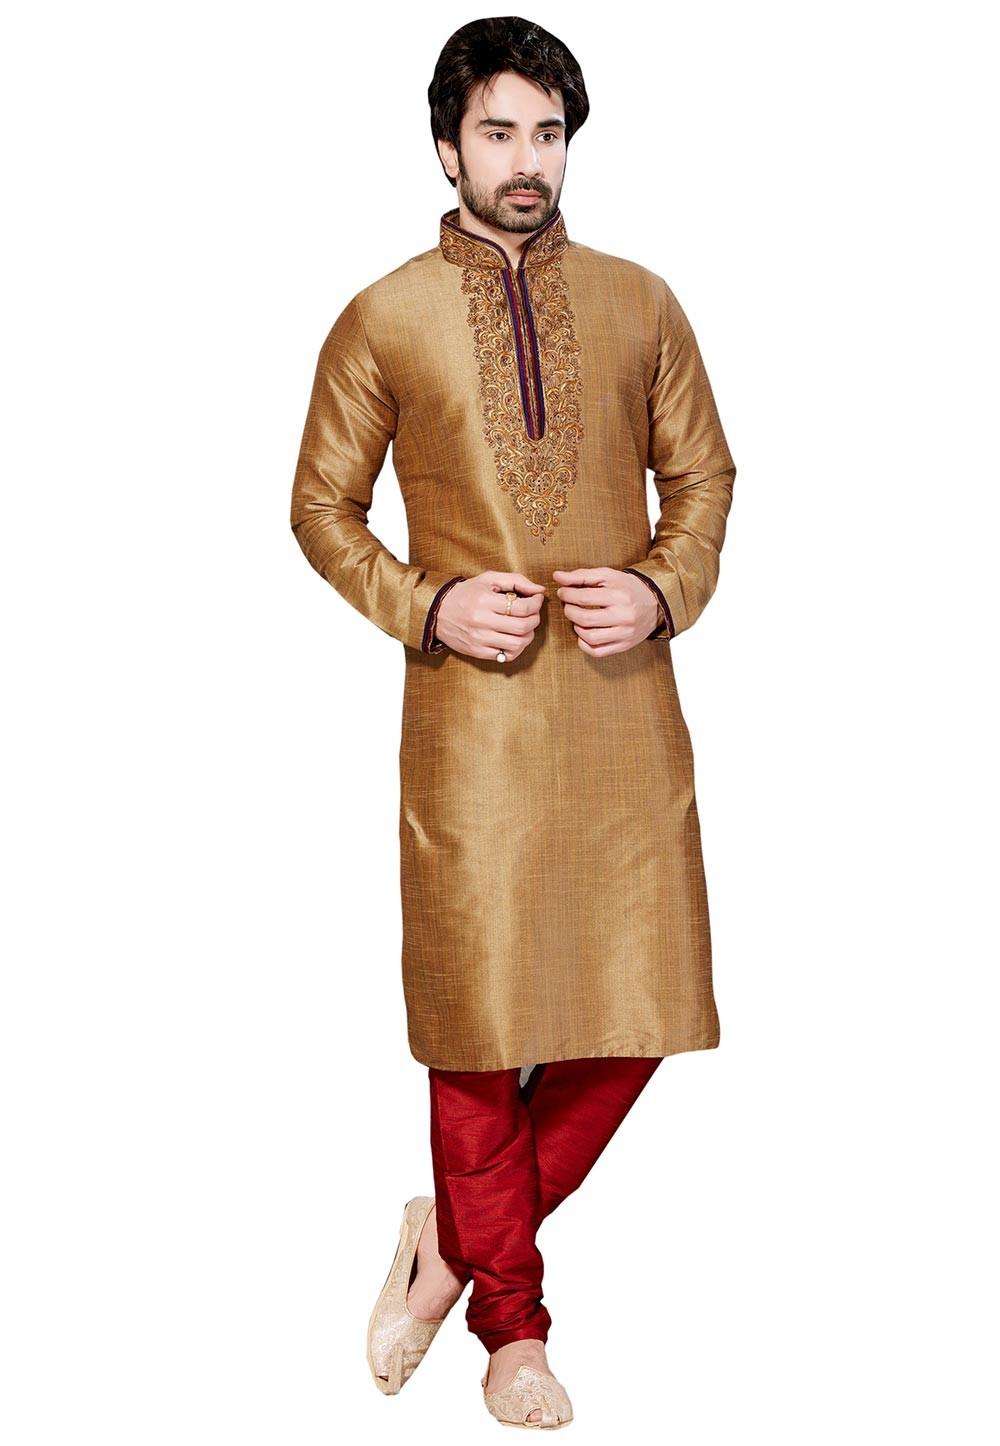 Exquisite Golden Color Dupion Silk Designer Kurta Pyjama.